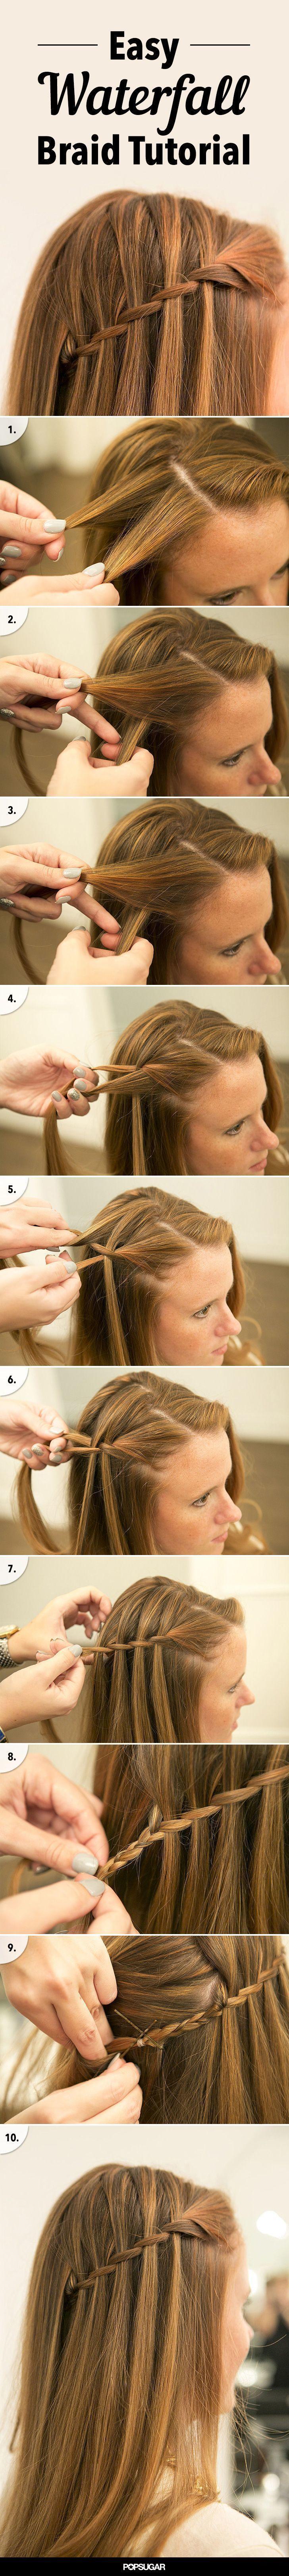 129 best School Hair Styles images on Pinterest